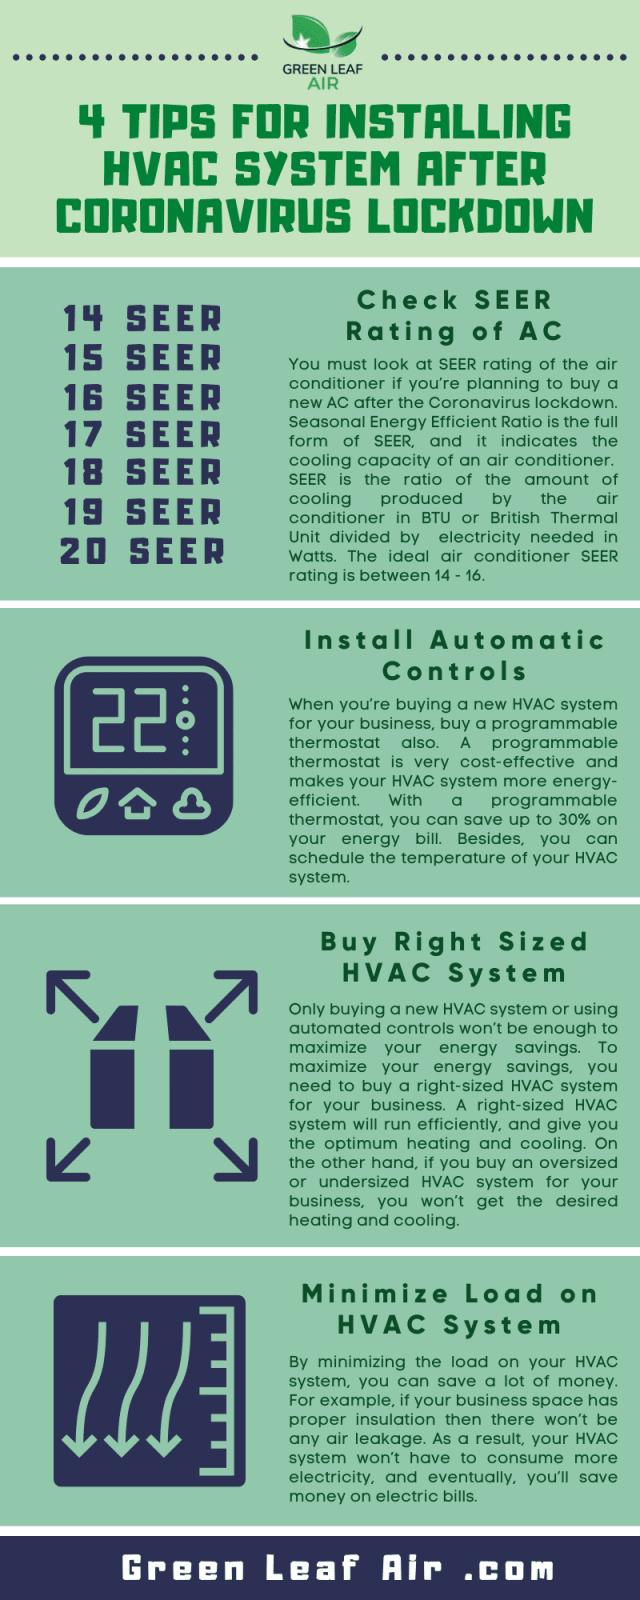 4 Tips for Installing HVAC System after Coronavirus Lockdown